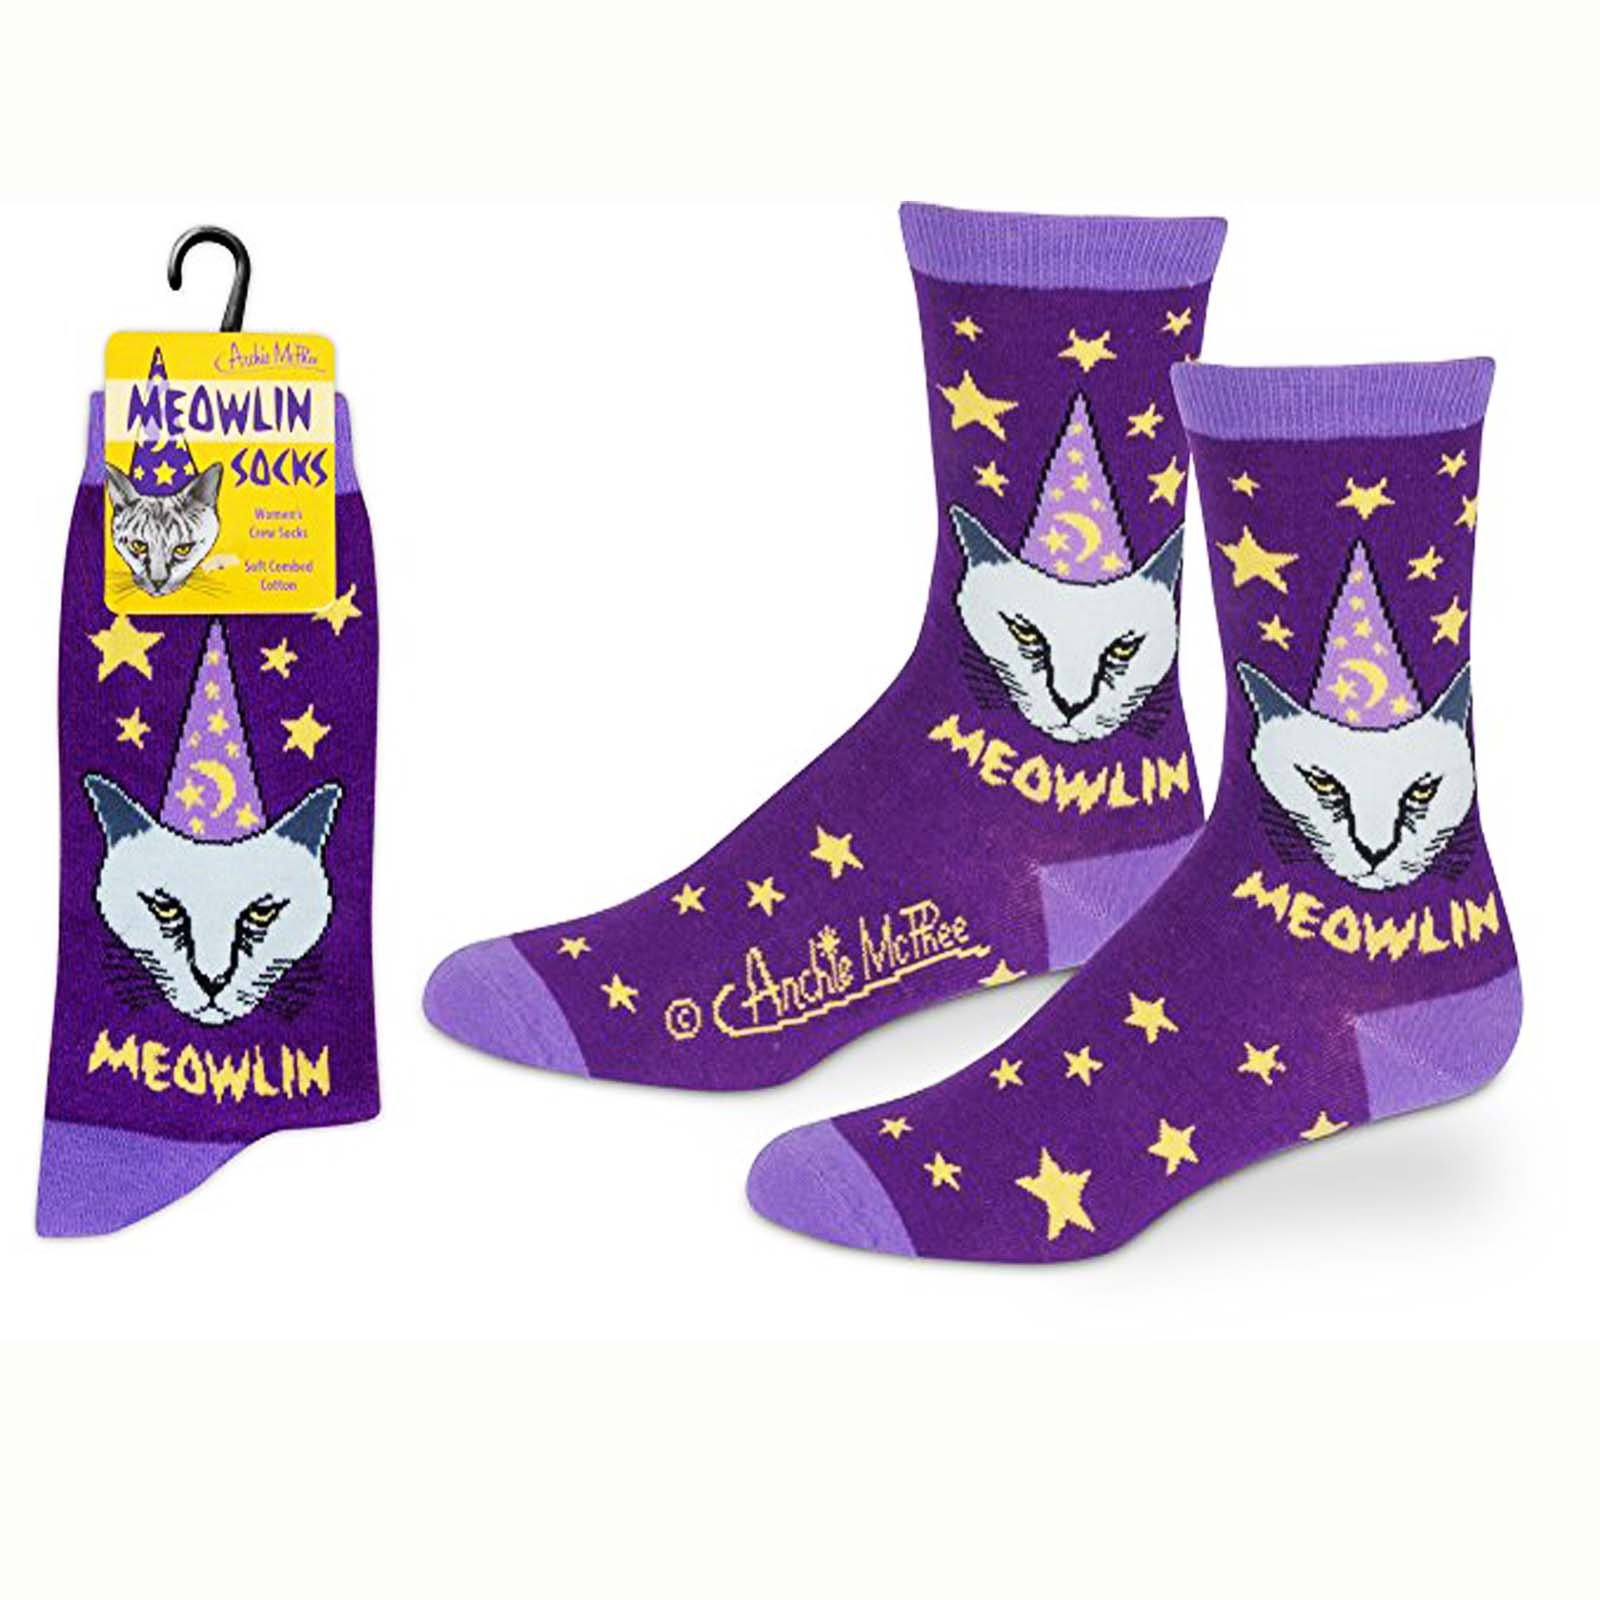 Accoutrements Meowlin Cat Womens 1 Pair Of Crew Socks Walmartcom